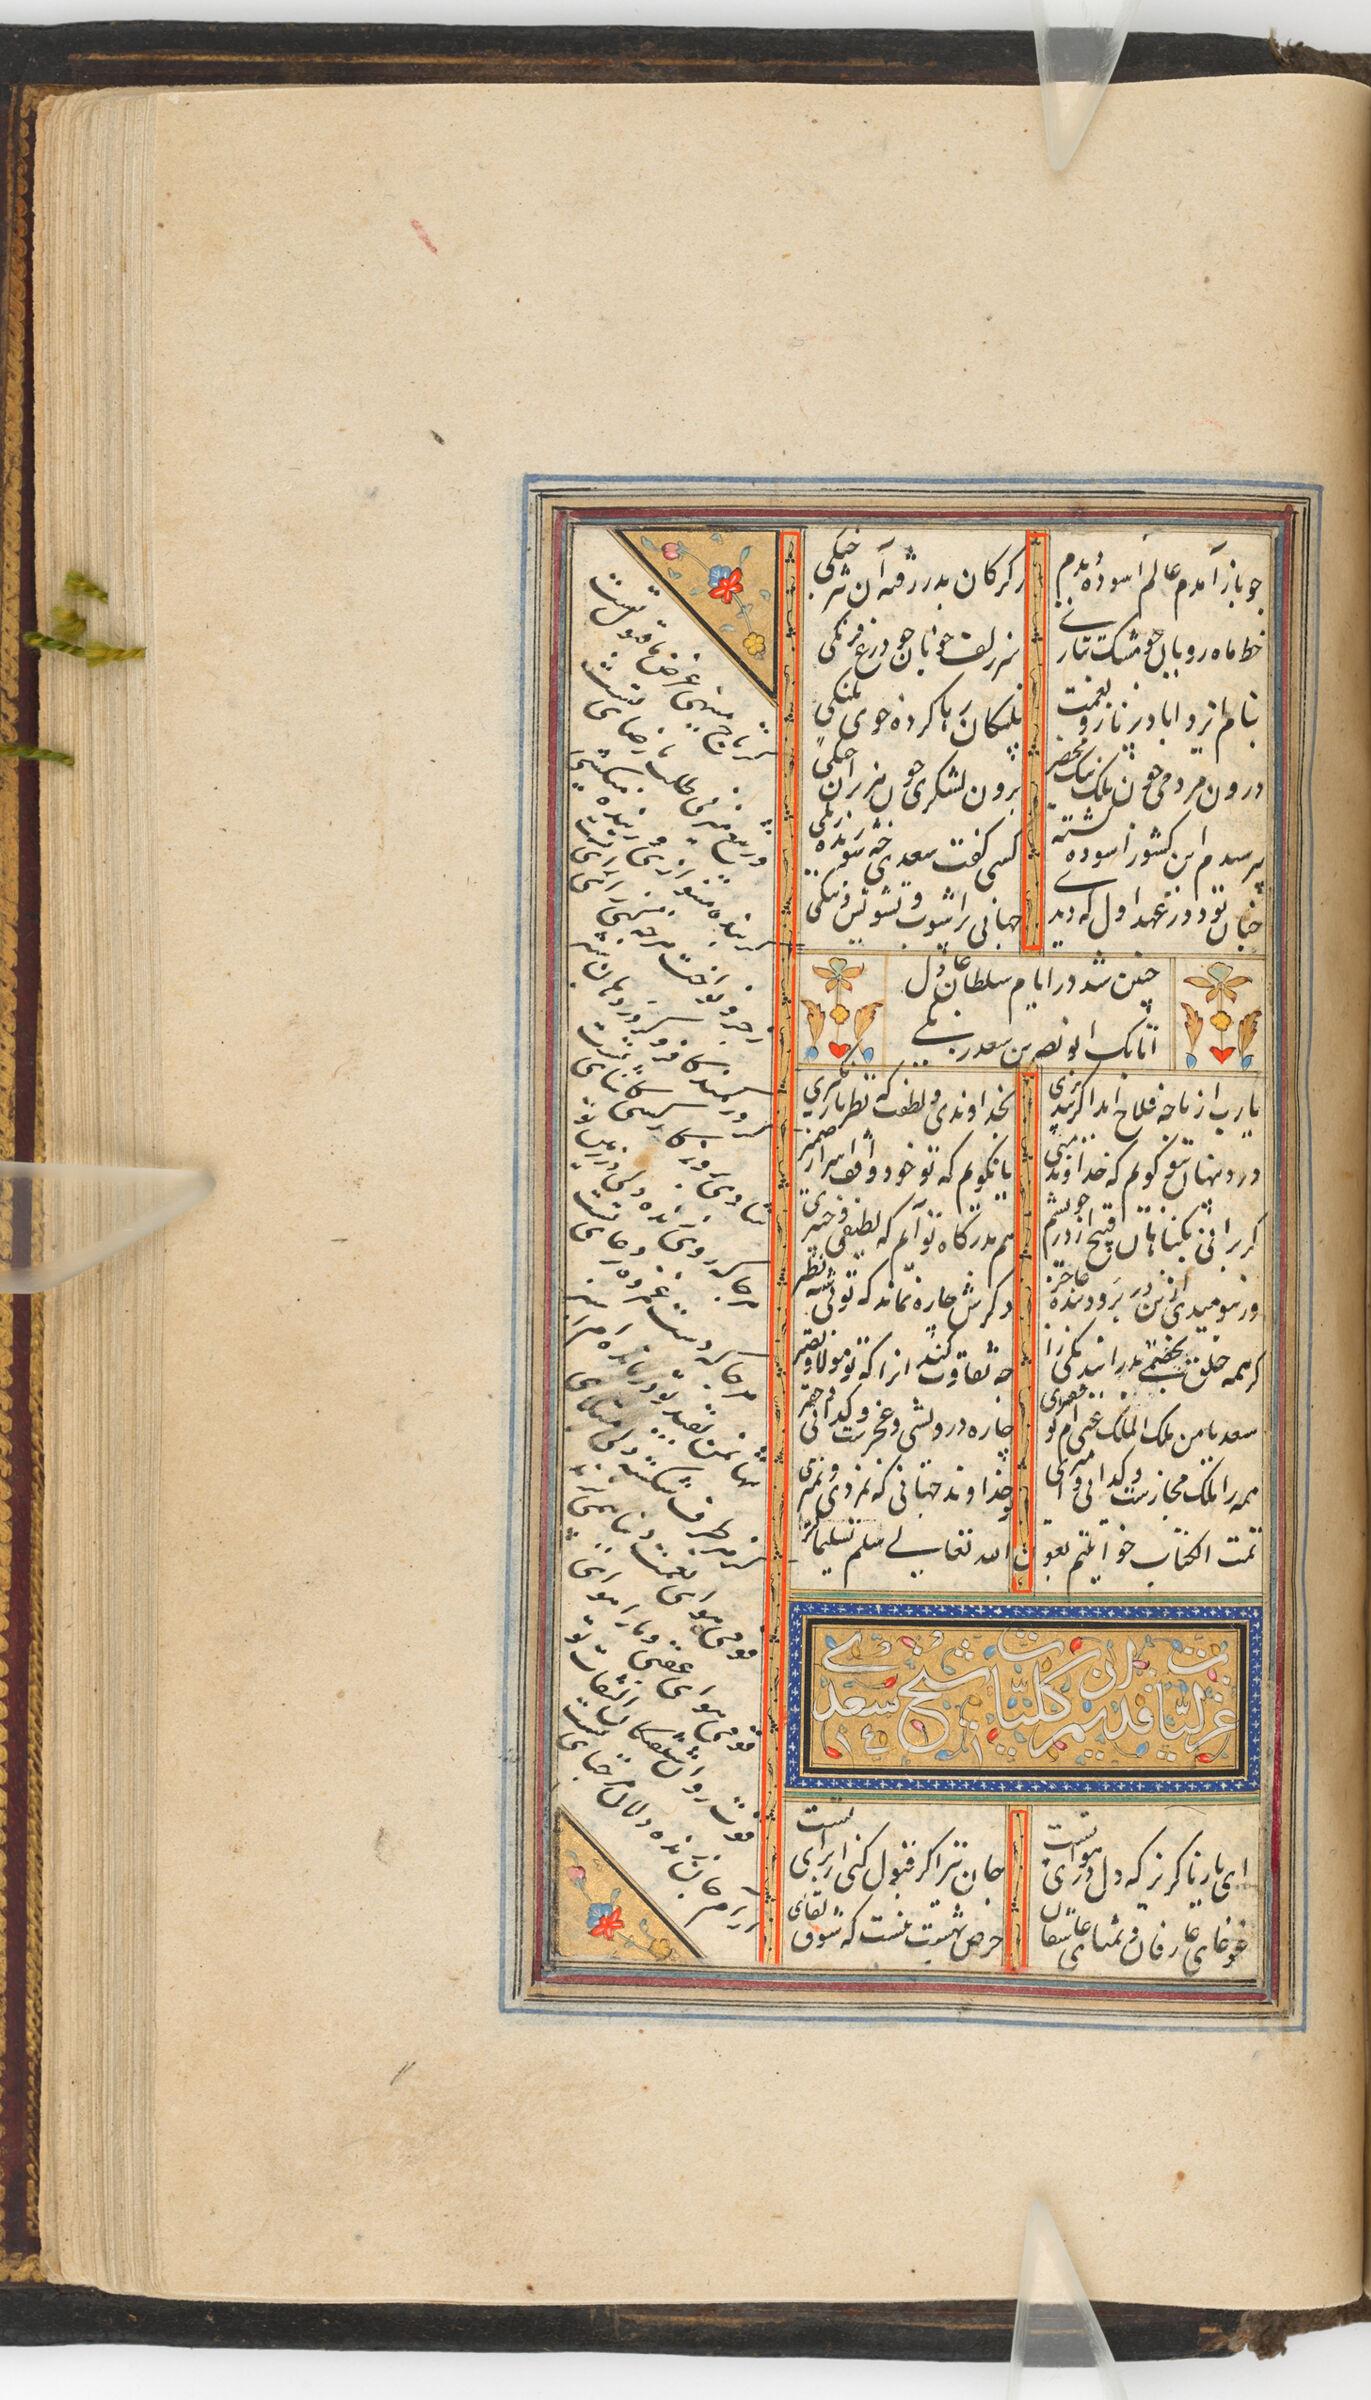 Text Folio With An Illuminated Heading (Text Recto; Text Folio With An Illuminated Headingverso Of Folio 305), From A Manuscript Of The Kulliyat Of Sa'di